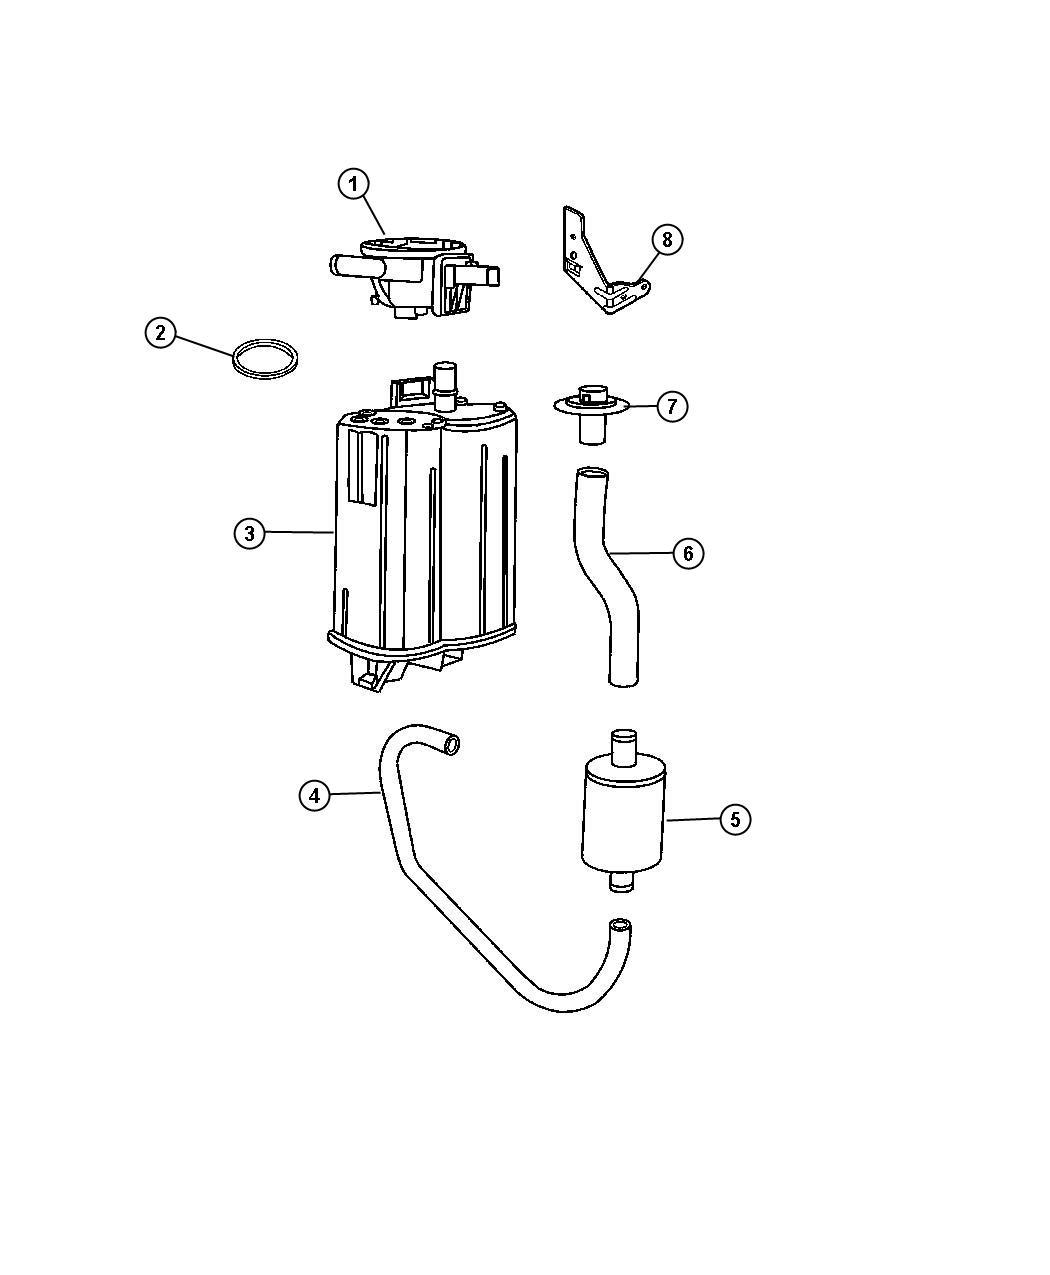 2004 Dodge Durango Vacuum Canister and Leak Detection Pump.